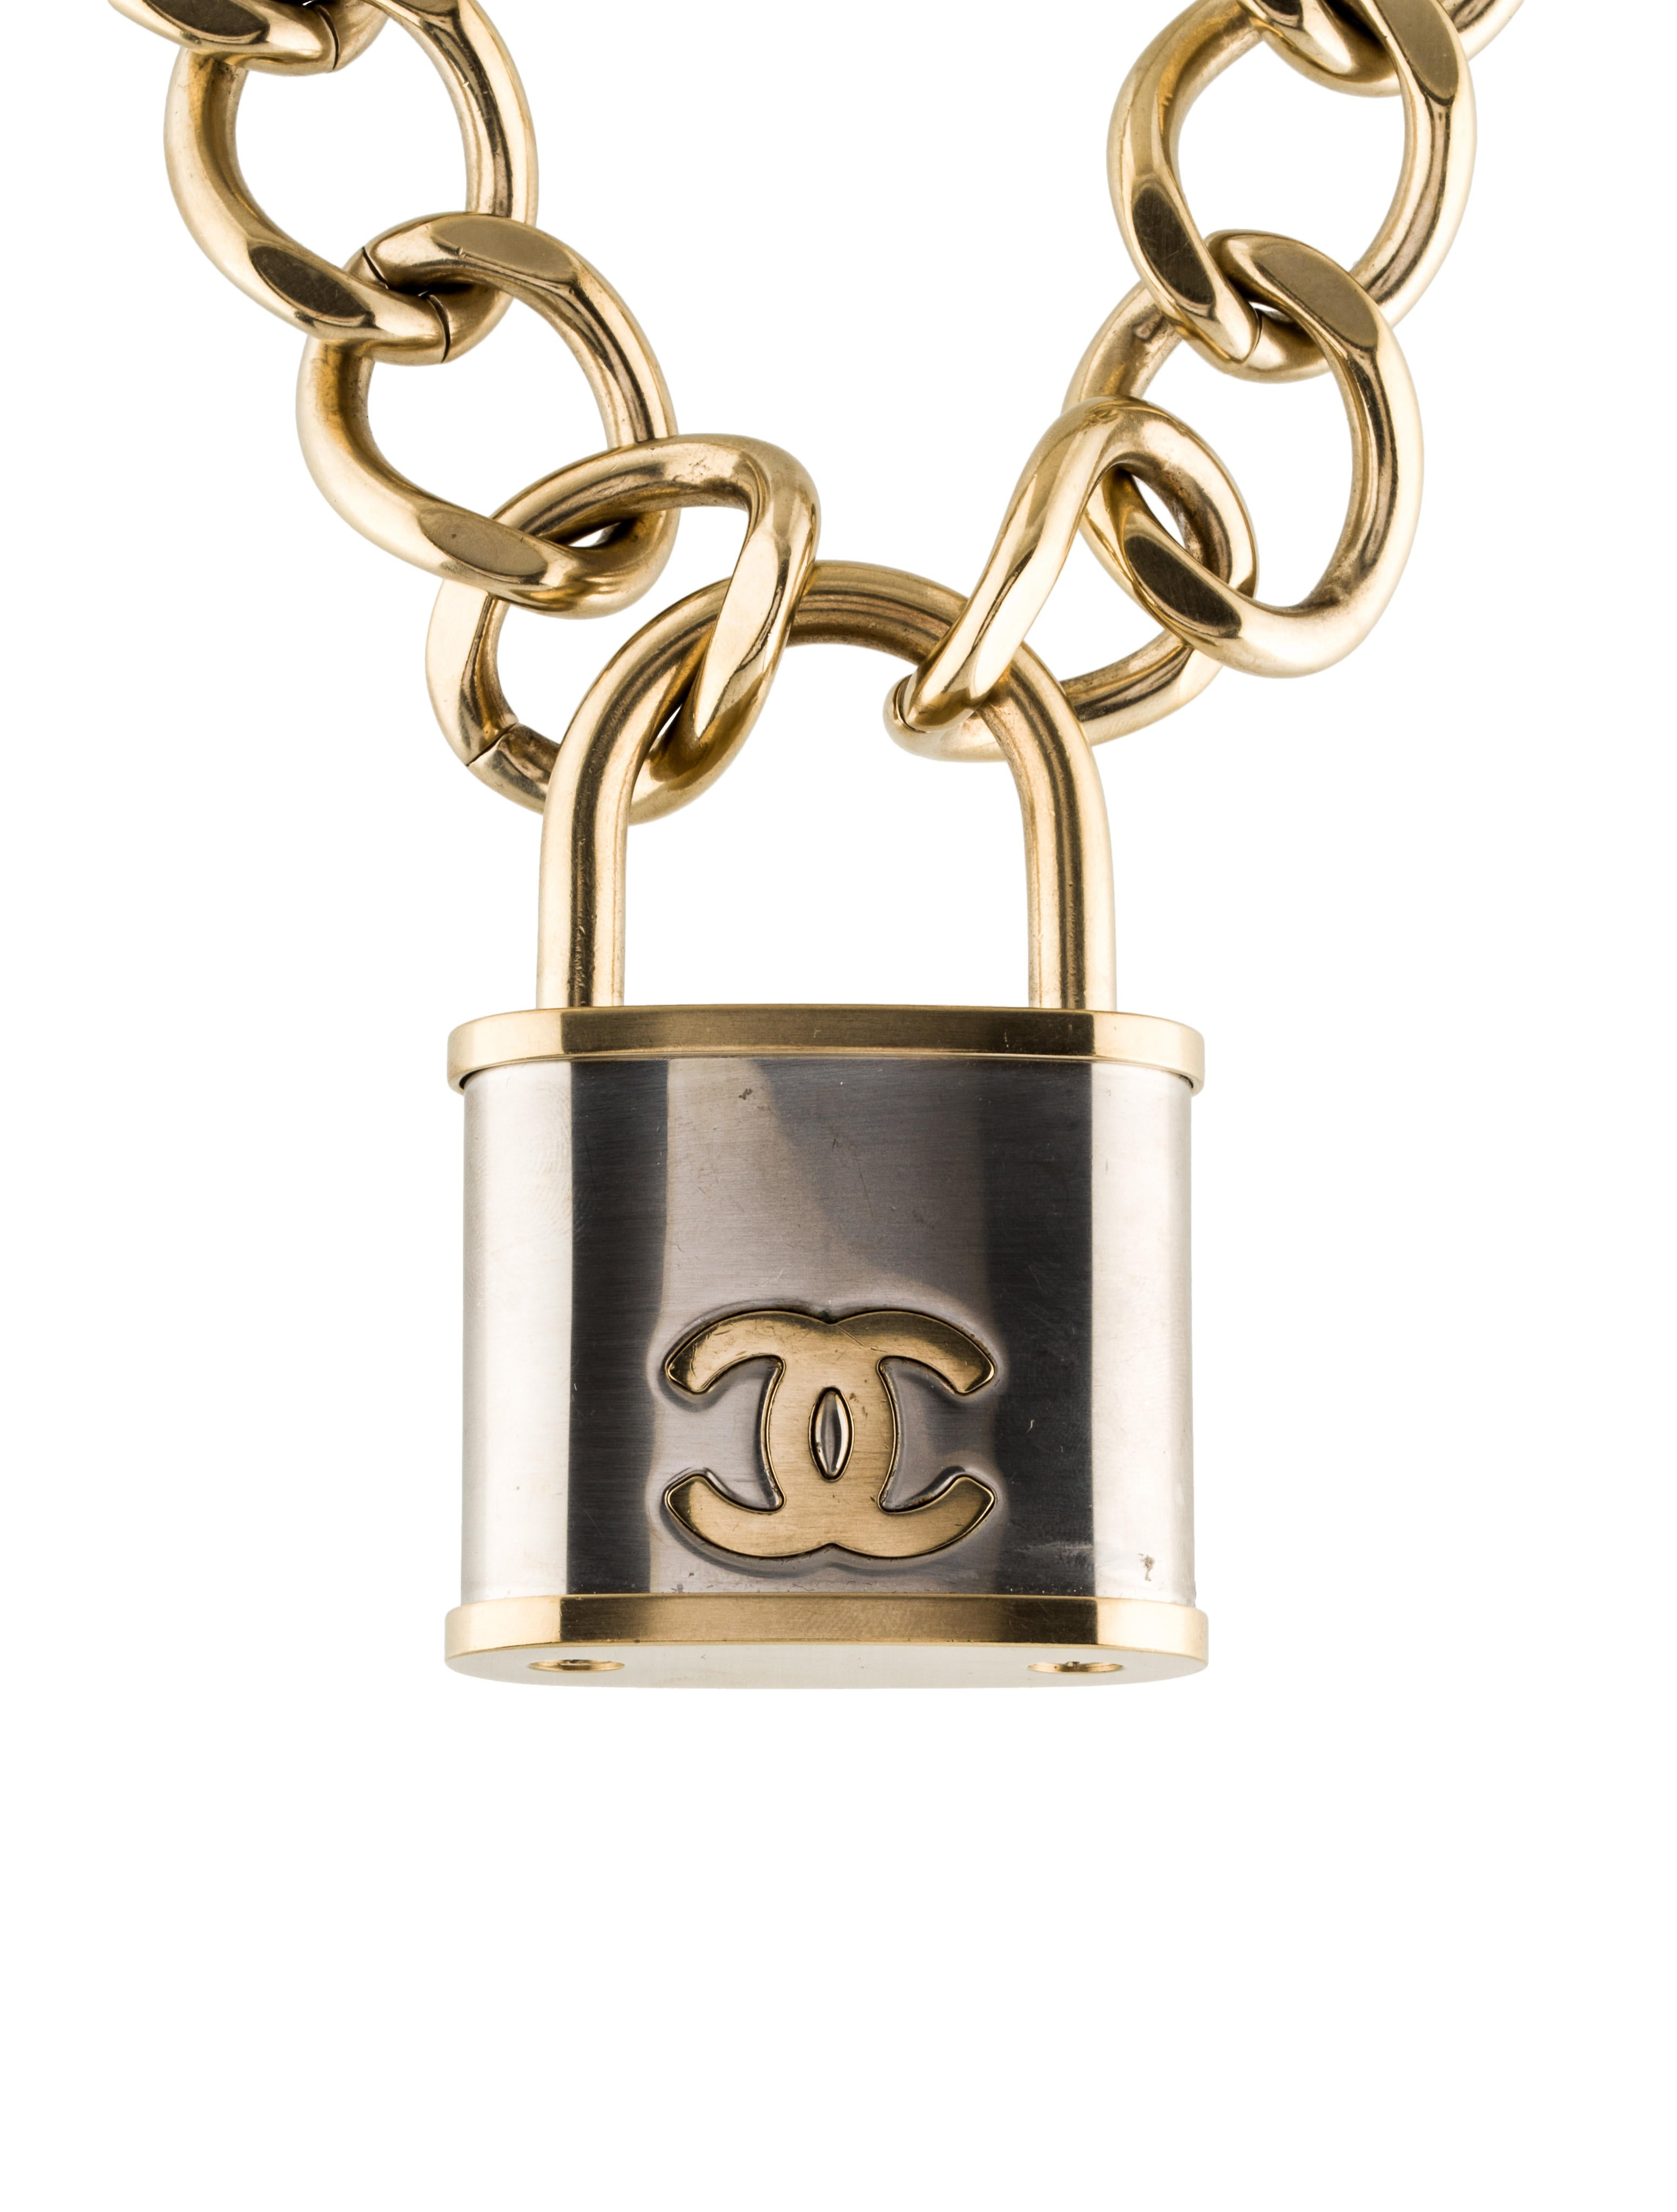 Chanel Cc Lock Pendant Necklace Necklaces Cha168656